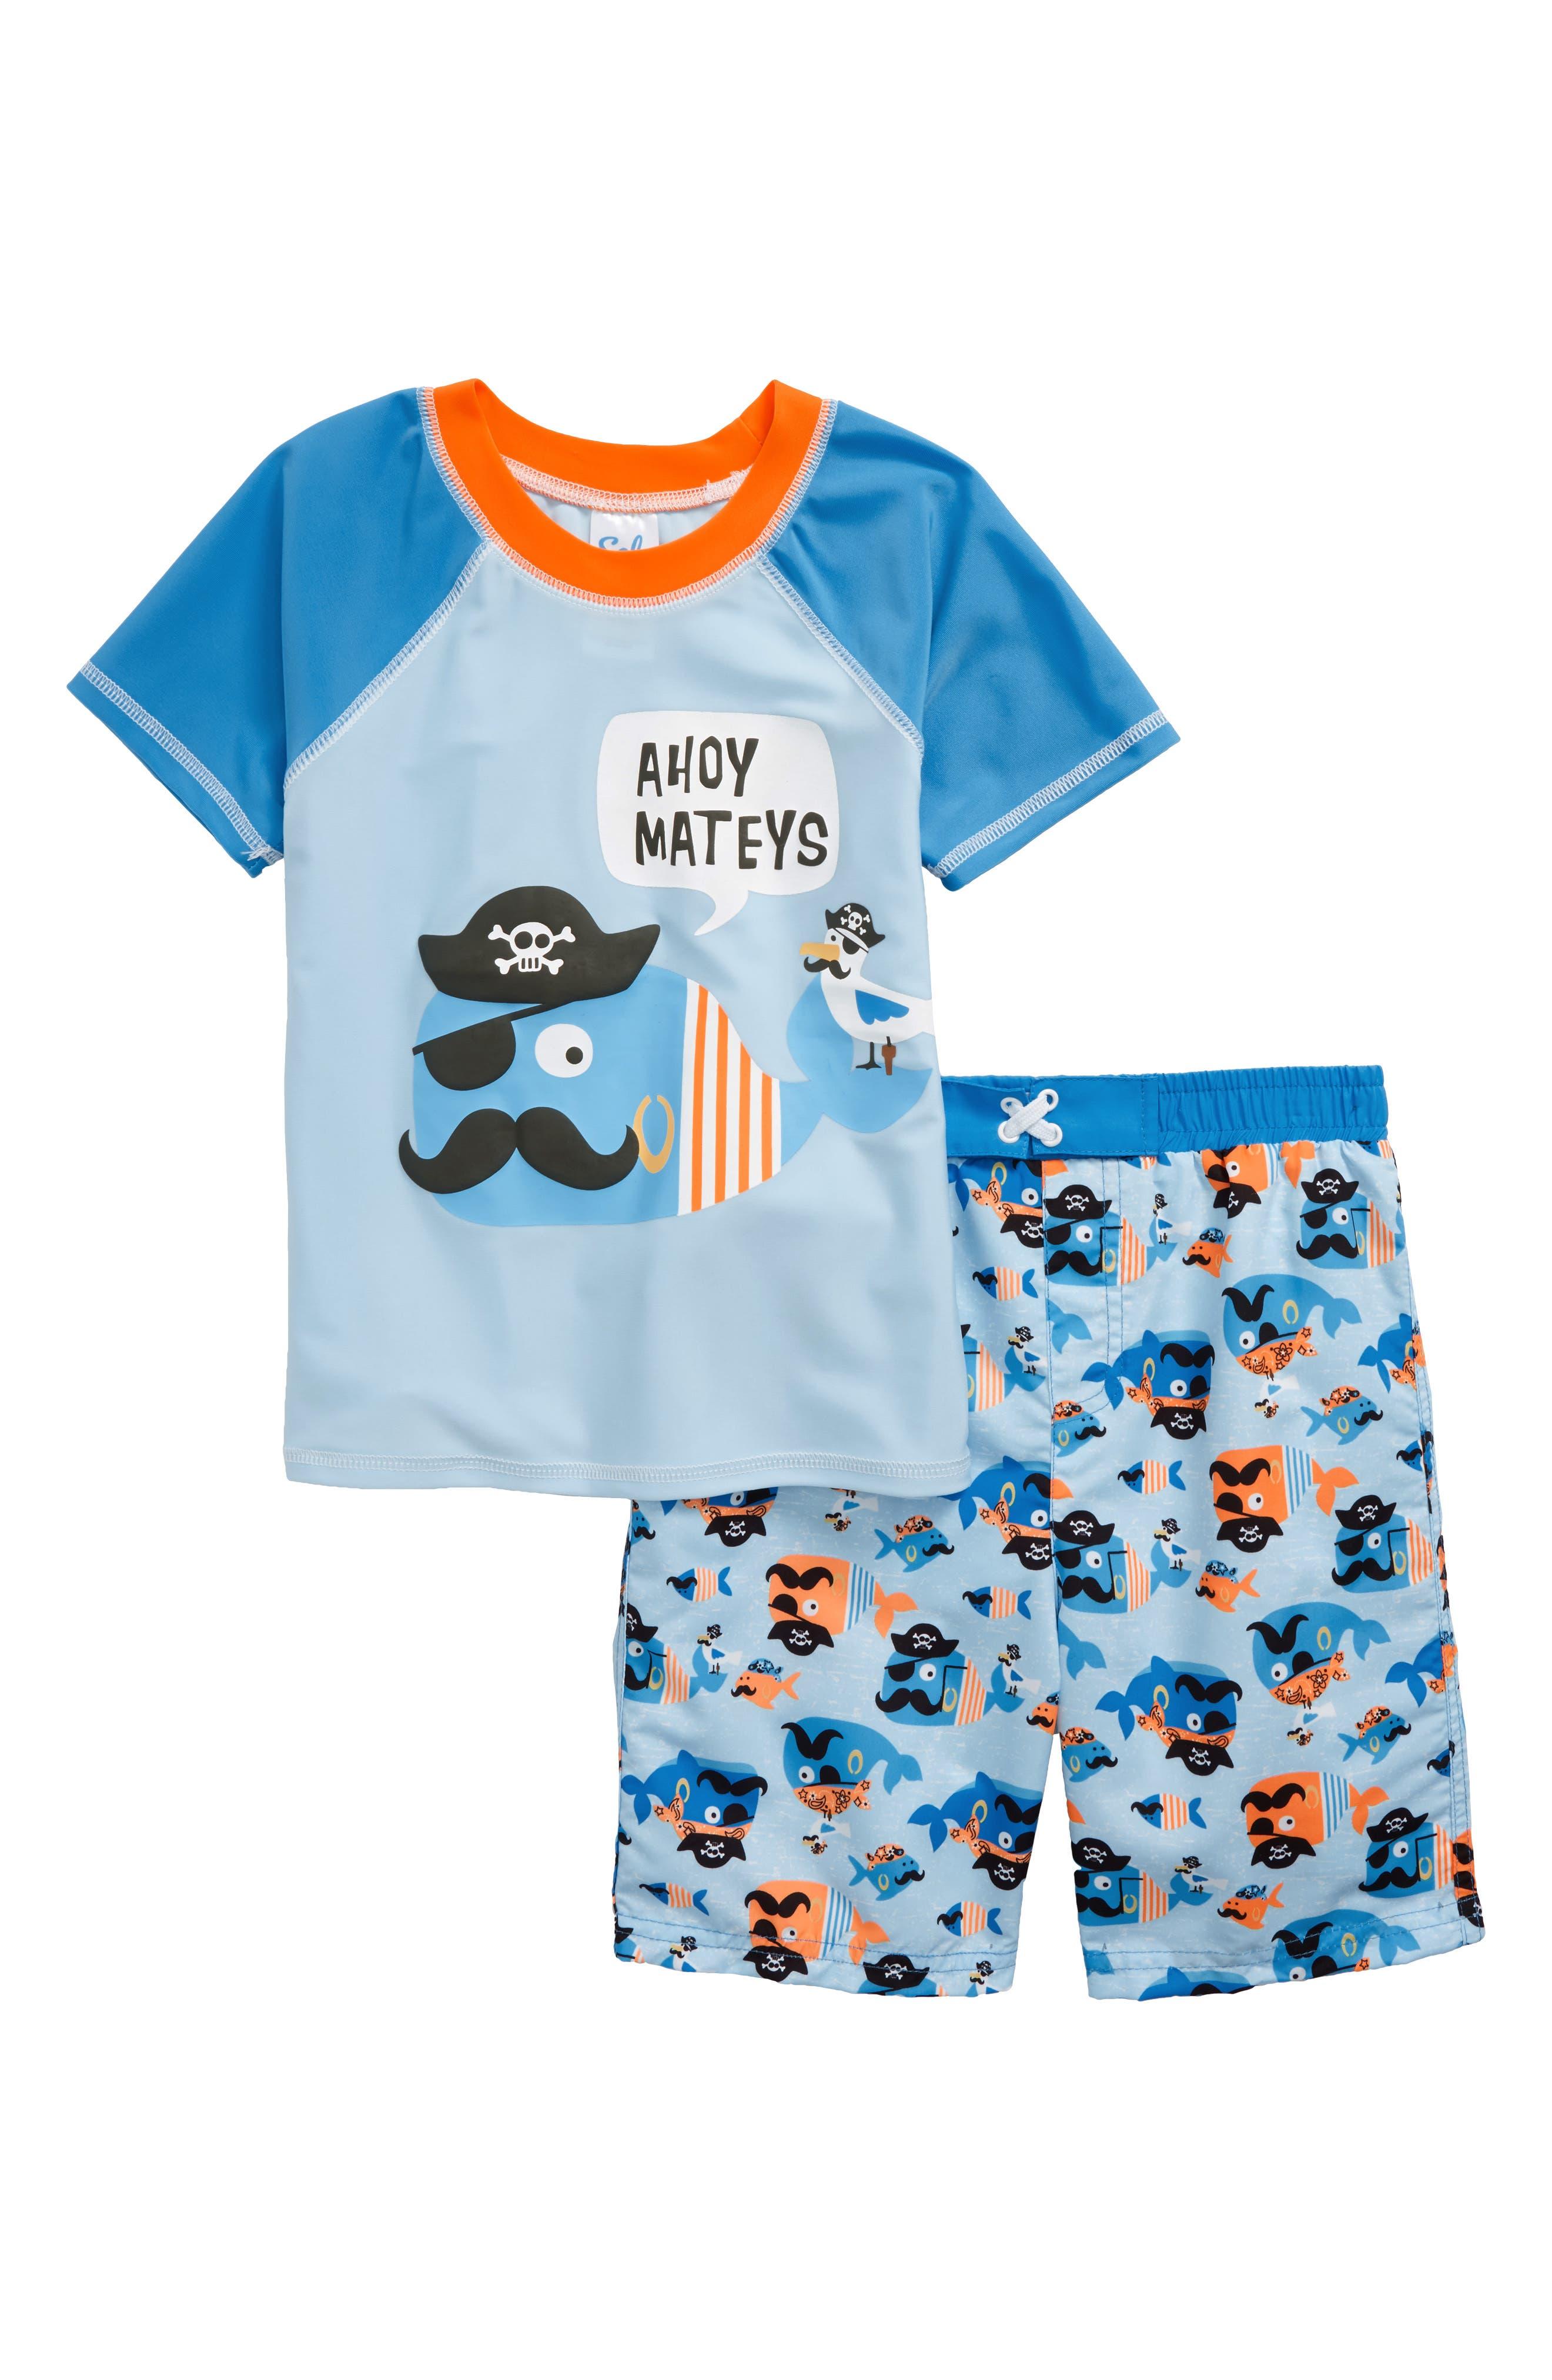 Main Image - Sol Swim Ahoy Mateys Two-Piece Rashguard Swimsuit (Toddler Boys & Little Boys)